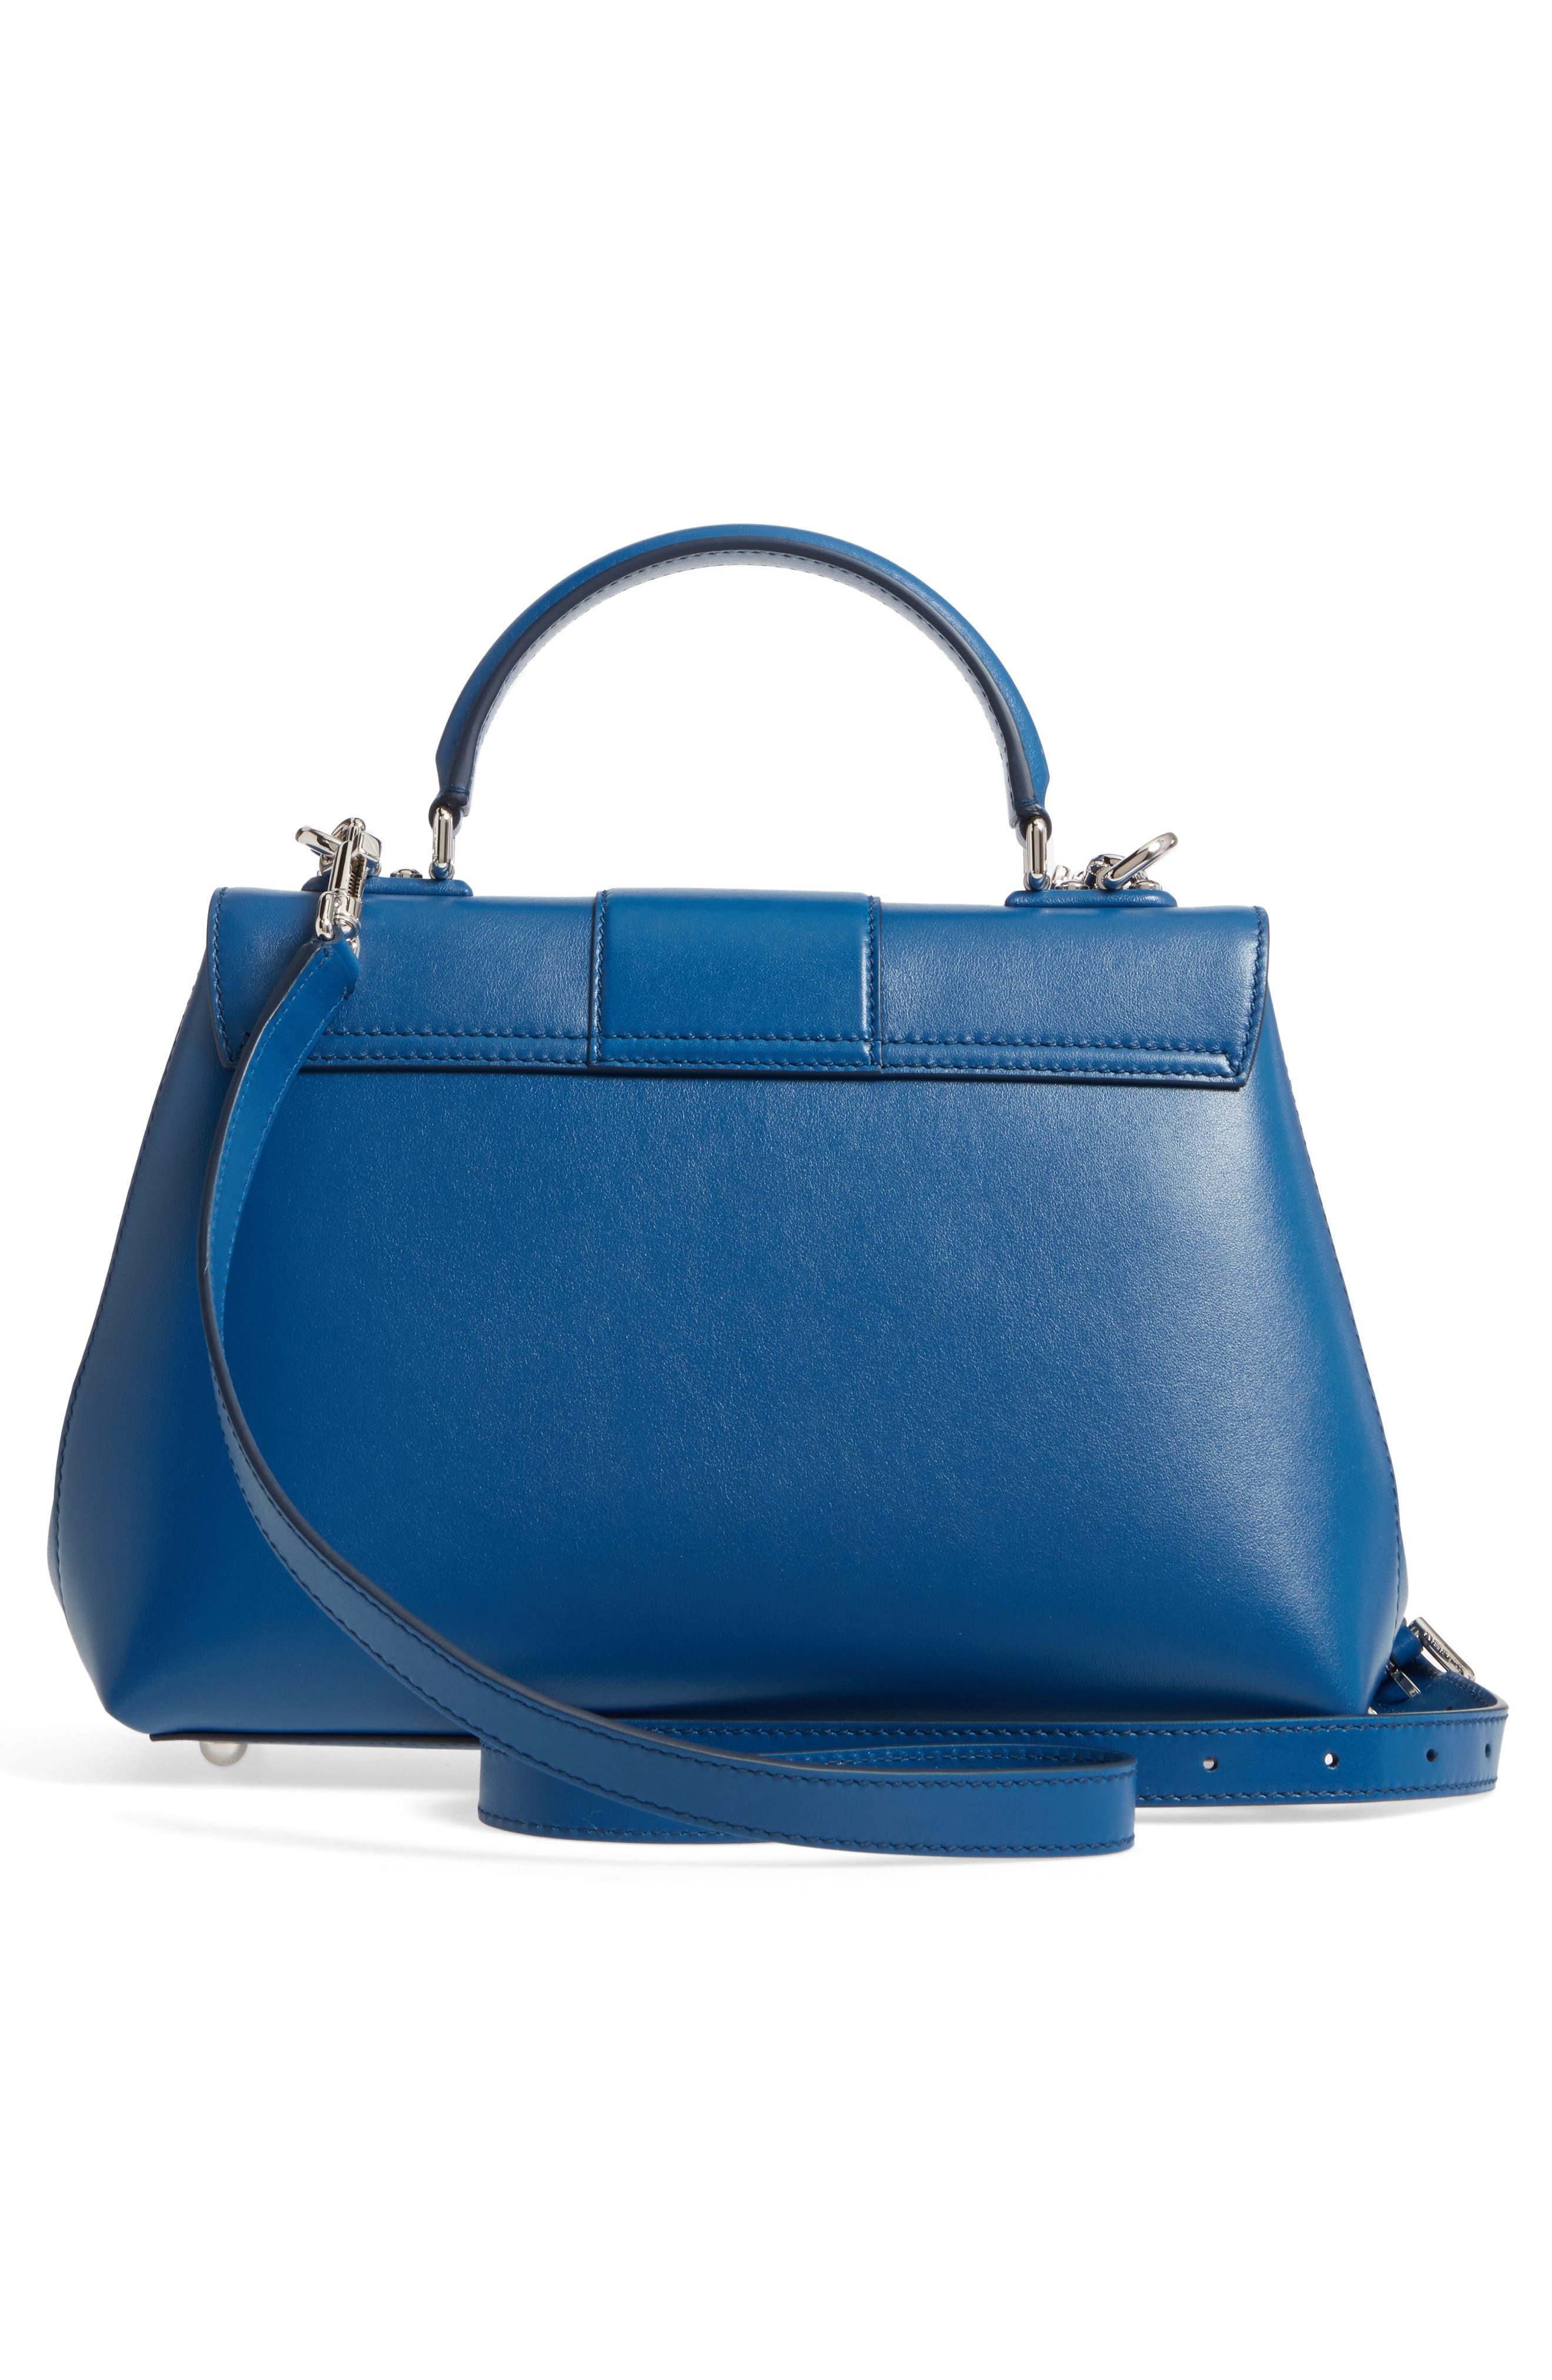 Medium Lucia Leather Satchel,                             Alternate thumbnail 2, color,                             Blue